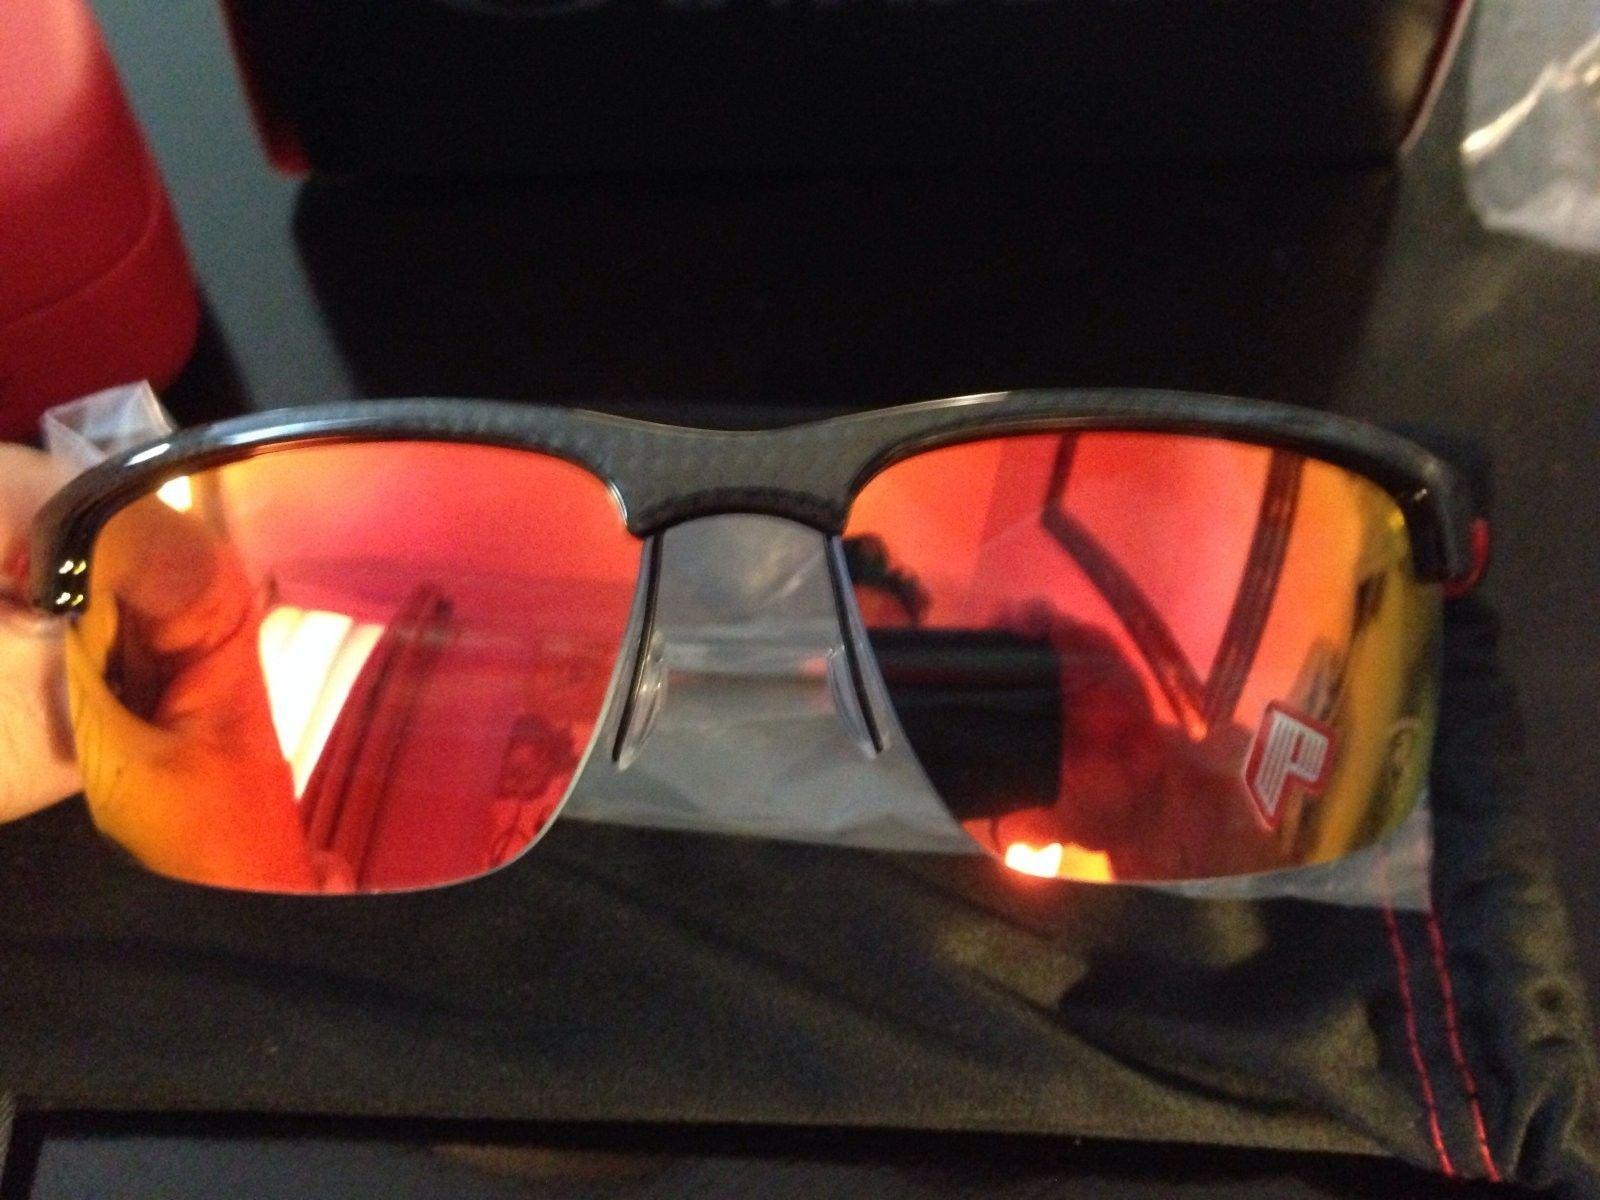 NIB Ferrari Carbon Blades - image.jpg